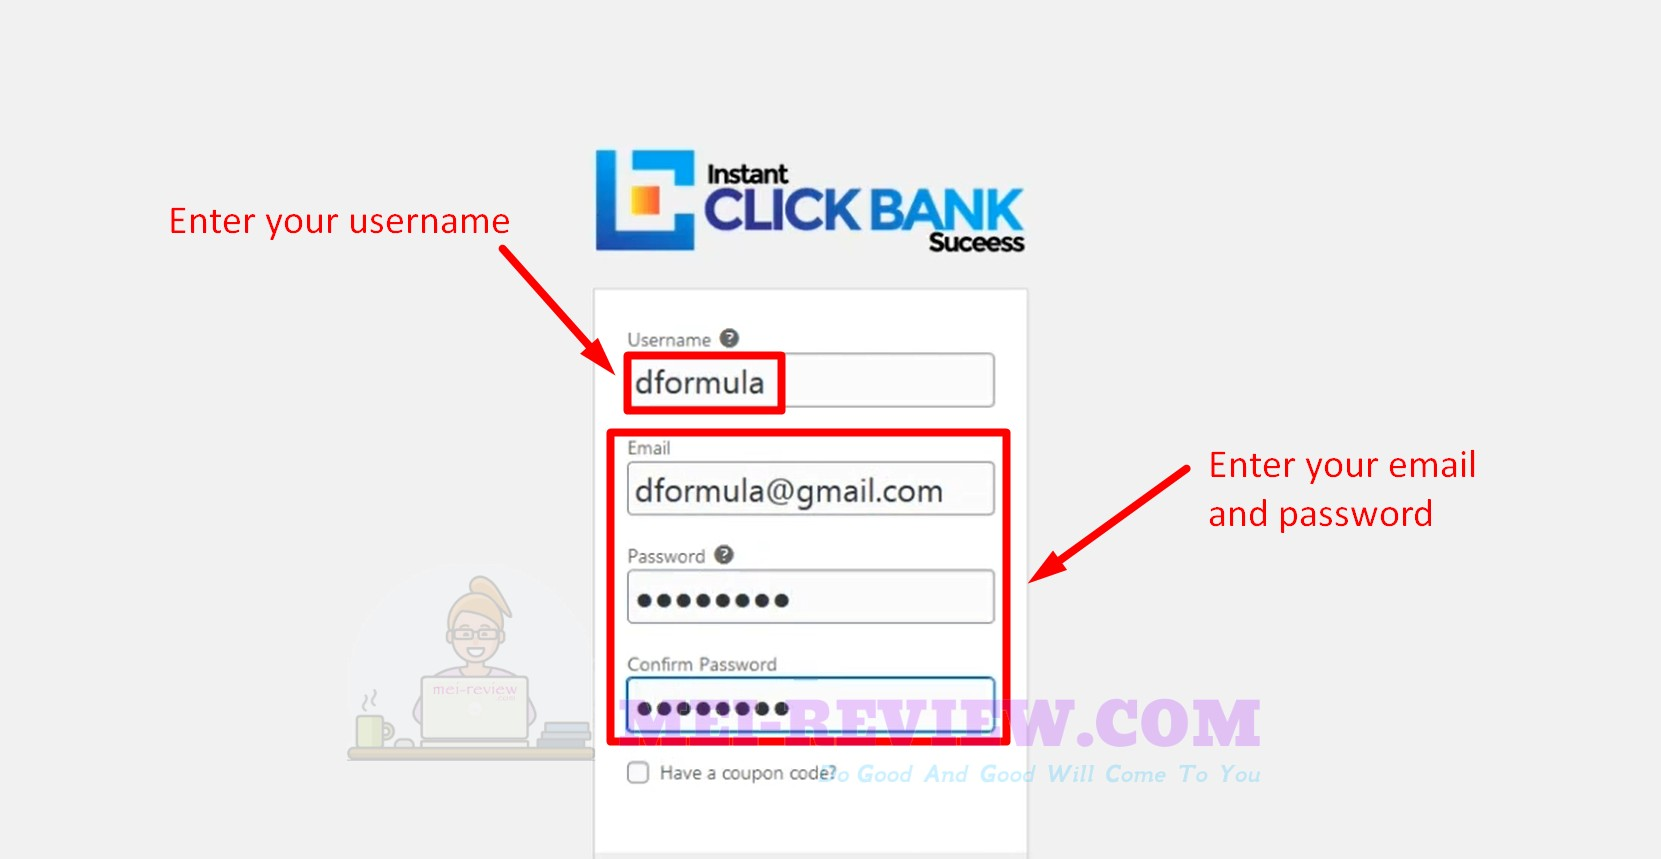 Instant-Clickbank-Success-Demo-2